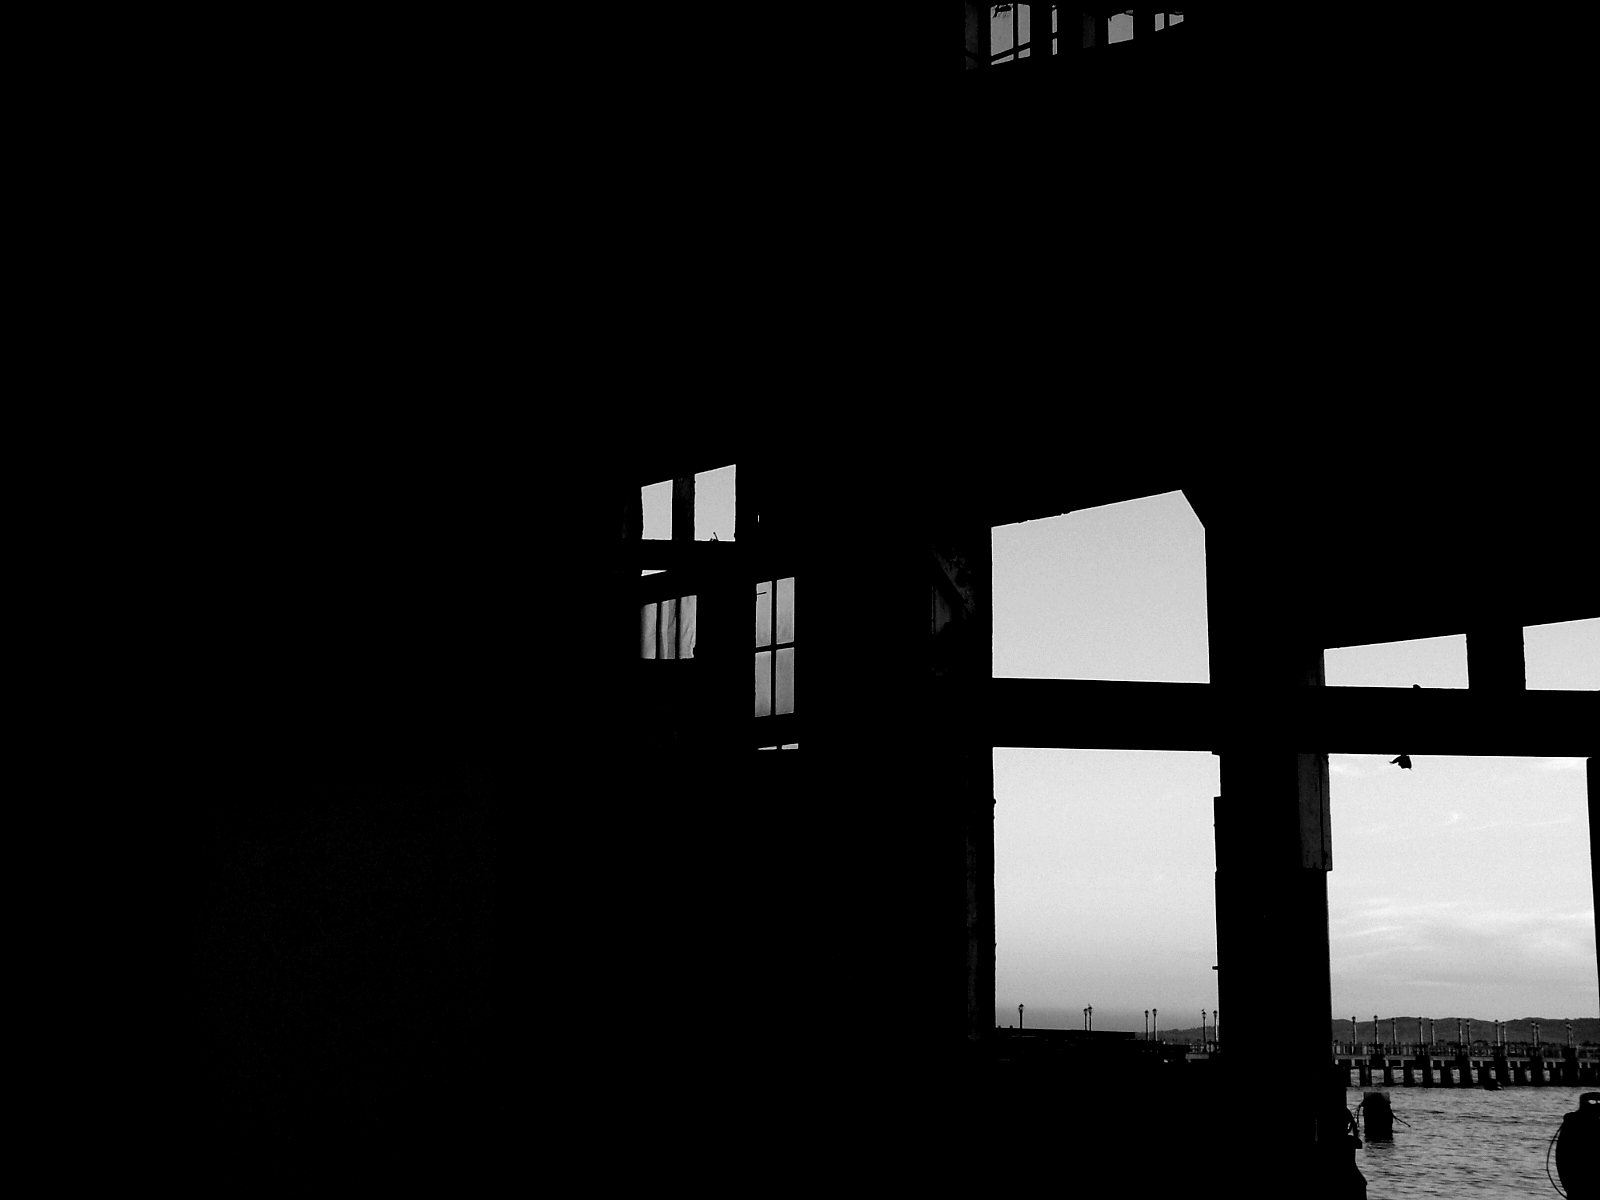 Windows photo